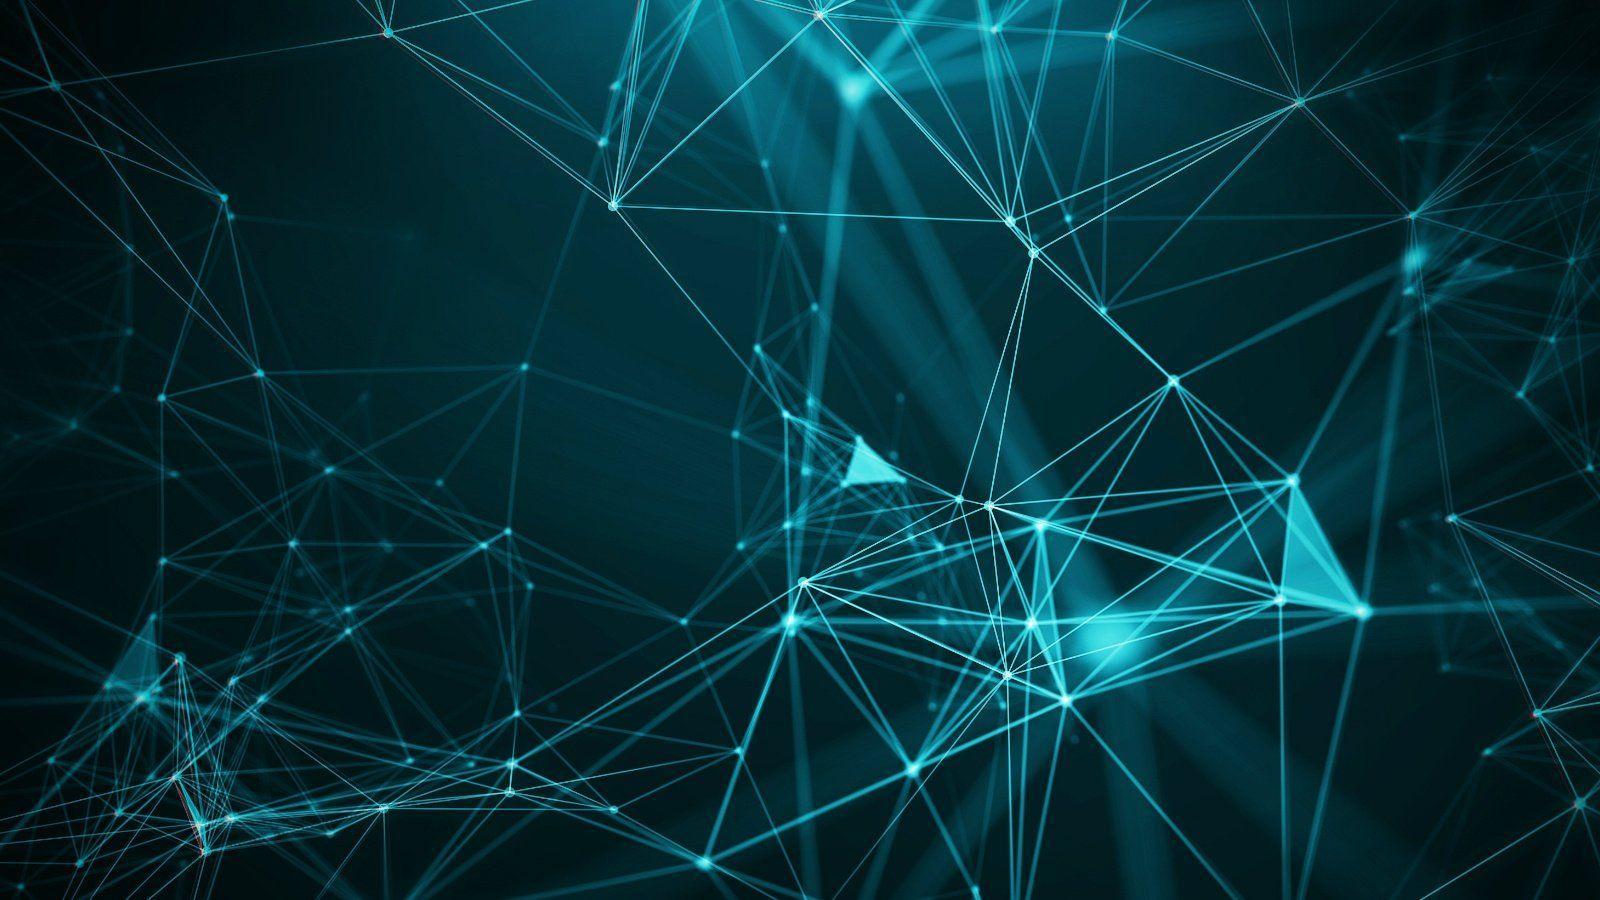 Big Data Wallpapers Top Free Big Data Backgrounds